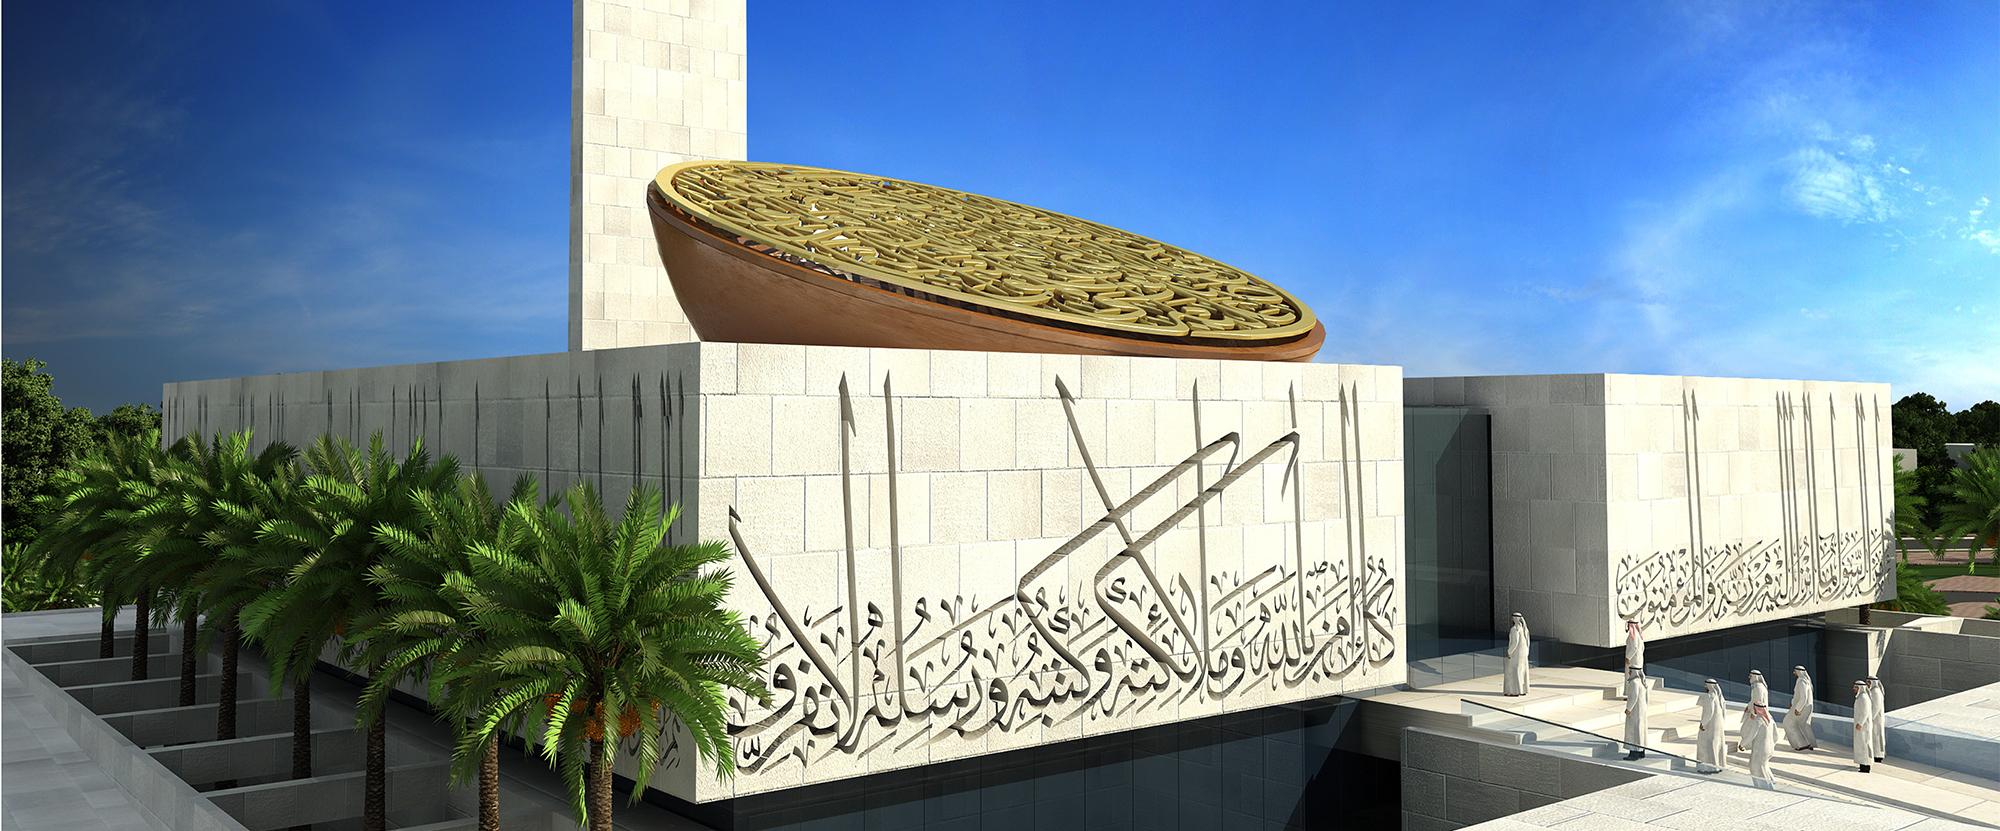 Saadiyat Beach Mosque BEAD religious 6.JPG